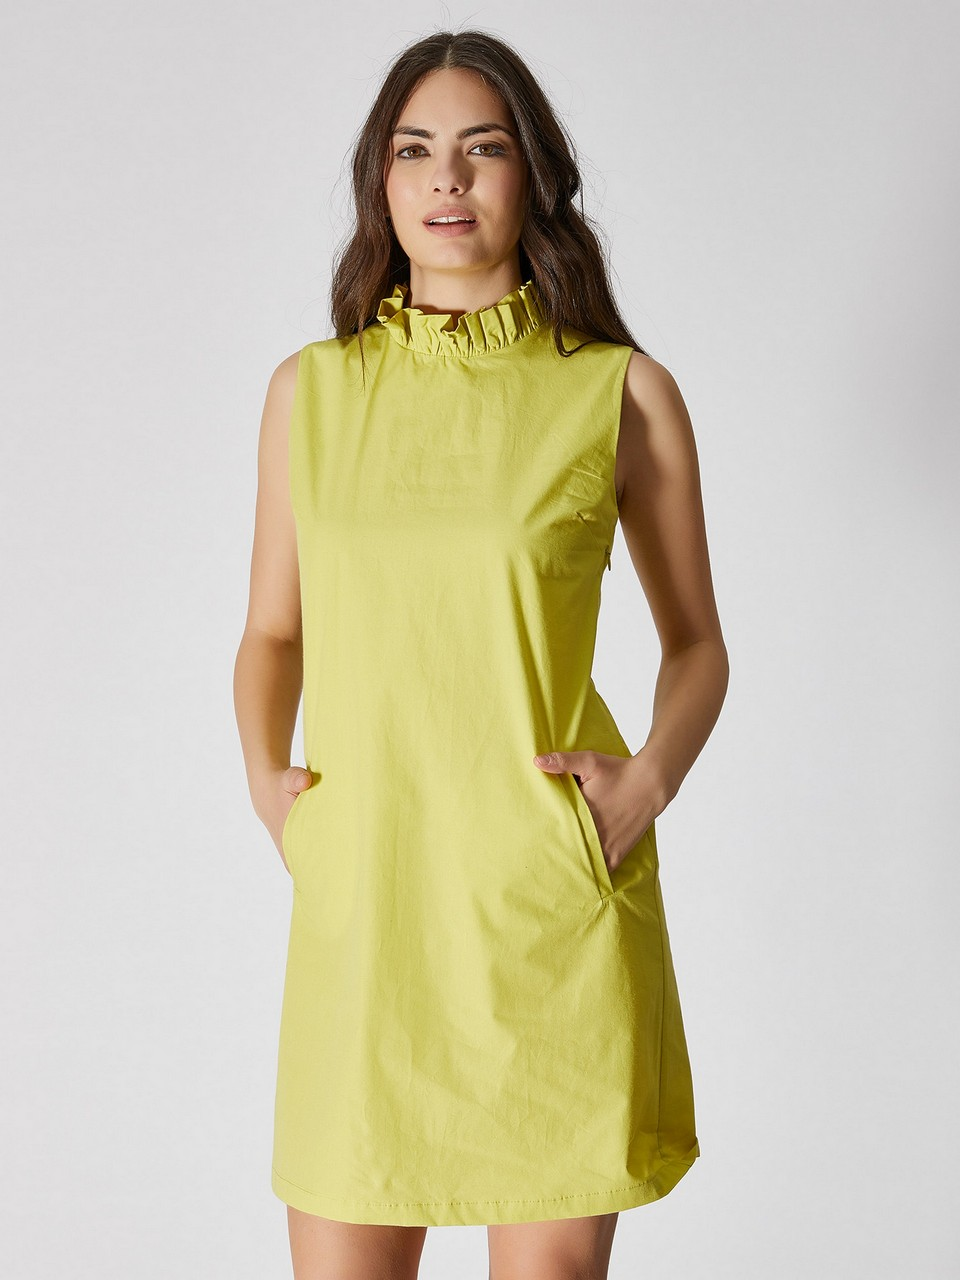 Sleeveless Bow Tie Detailed Mini Dress